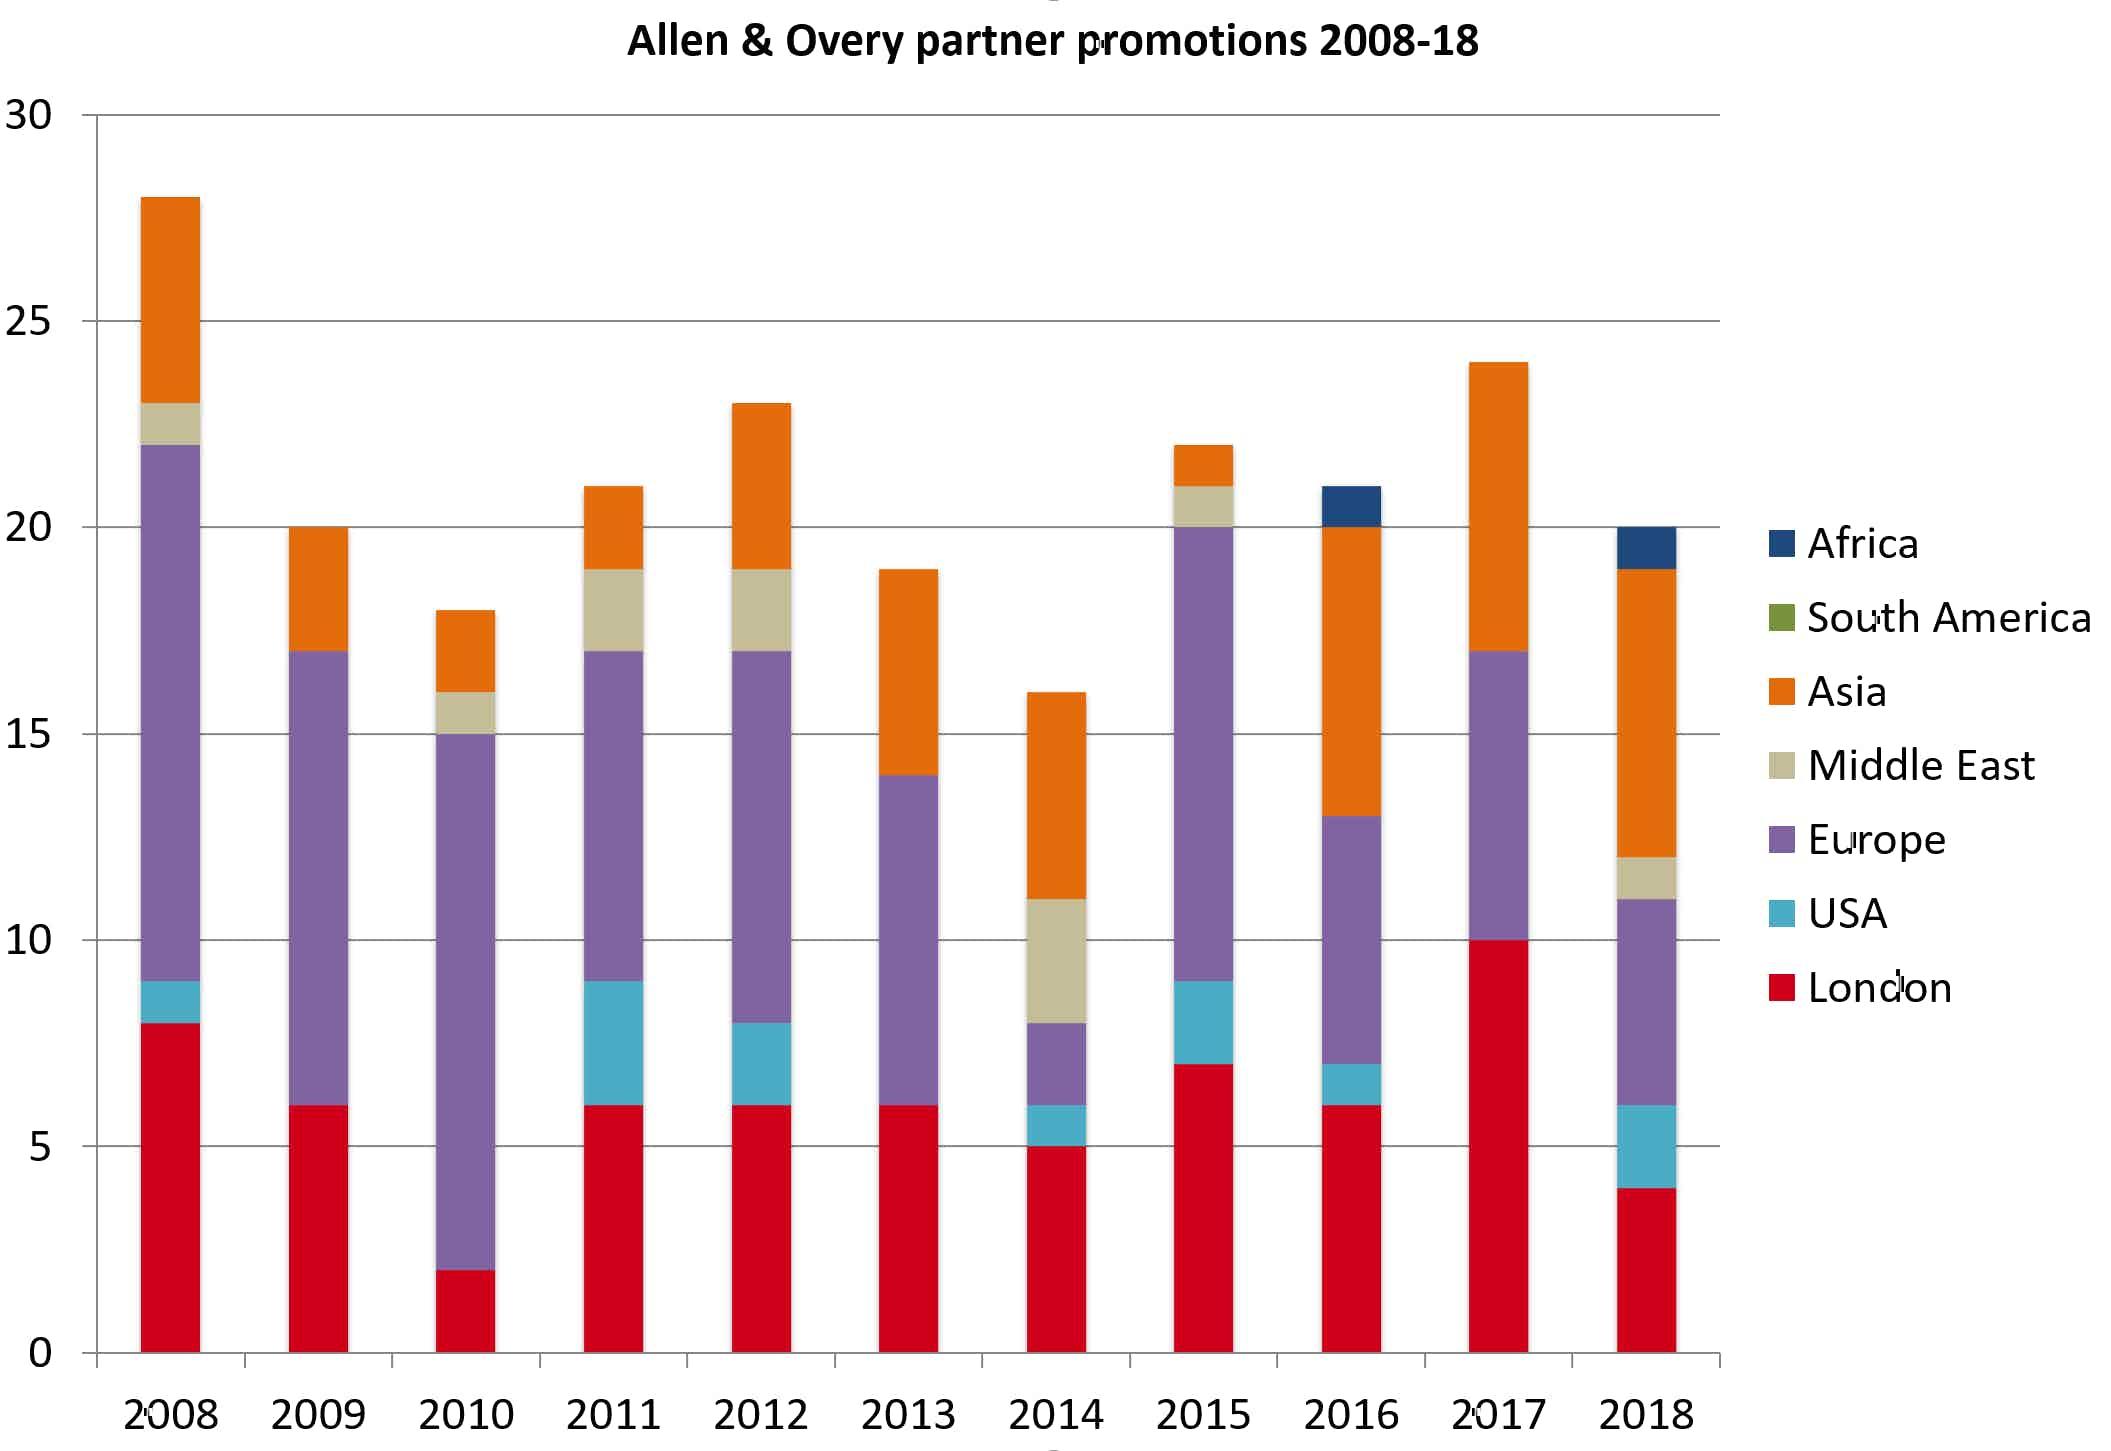 Allen & Overy partner promotions 2018